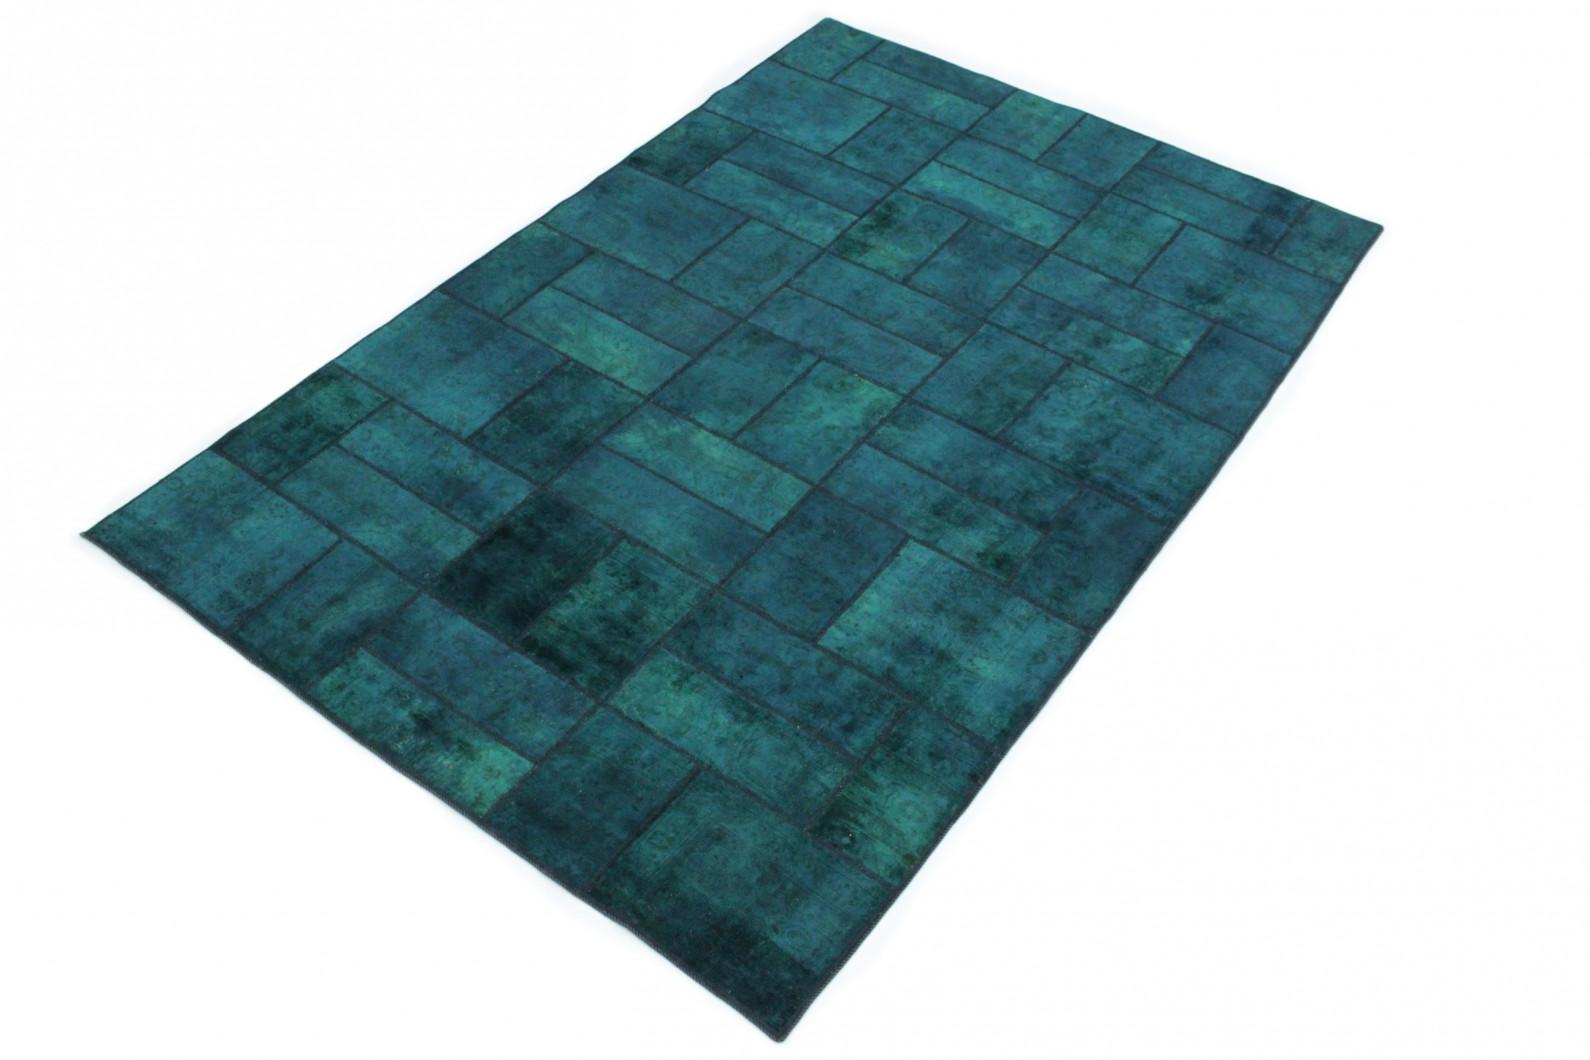 patchwork teppich blau t rkis in 310x200 1001 167109 bei. Black Bedroom Furniture Sets. Home Design Ideas